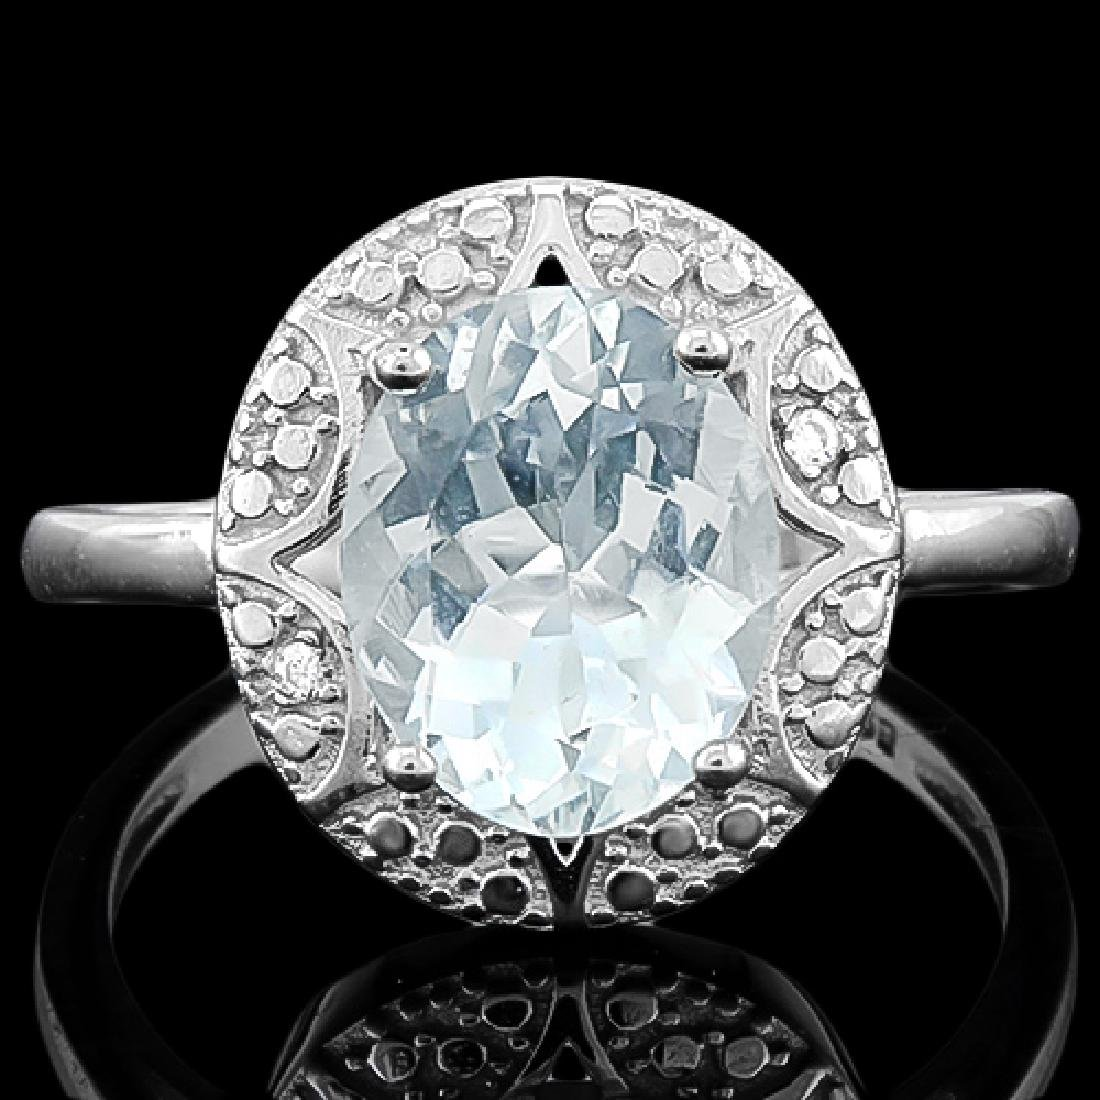 2 1/3 CARAT AQUAMARINE & DIAMOND 925 STERLING SILVER RI